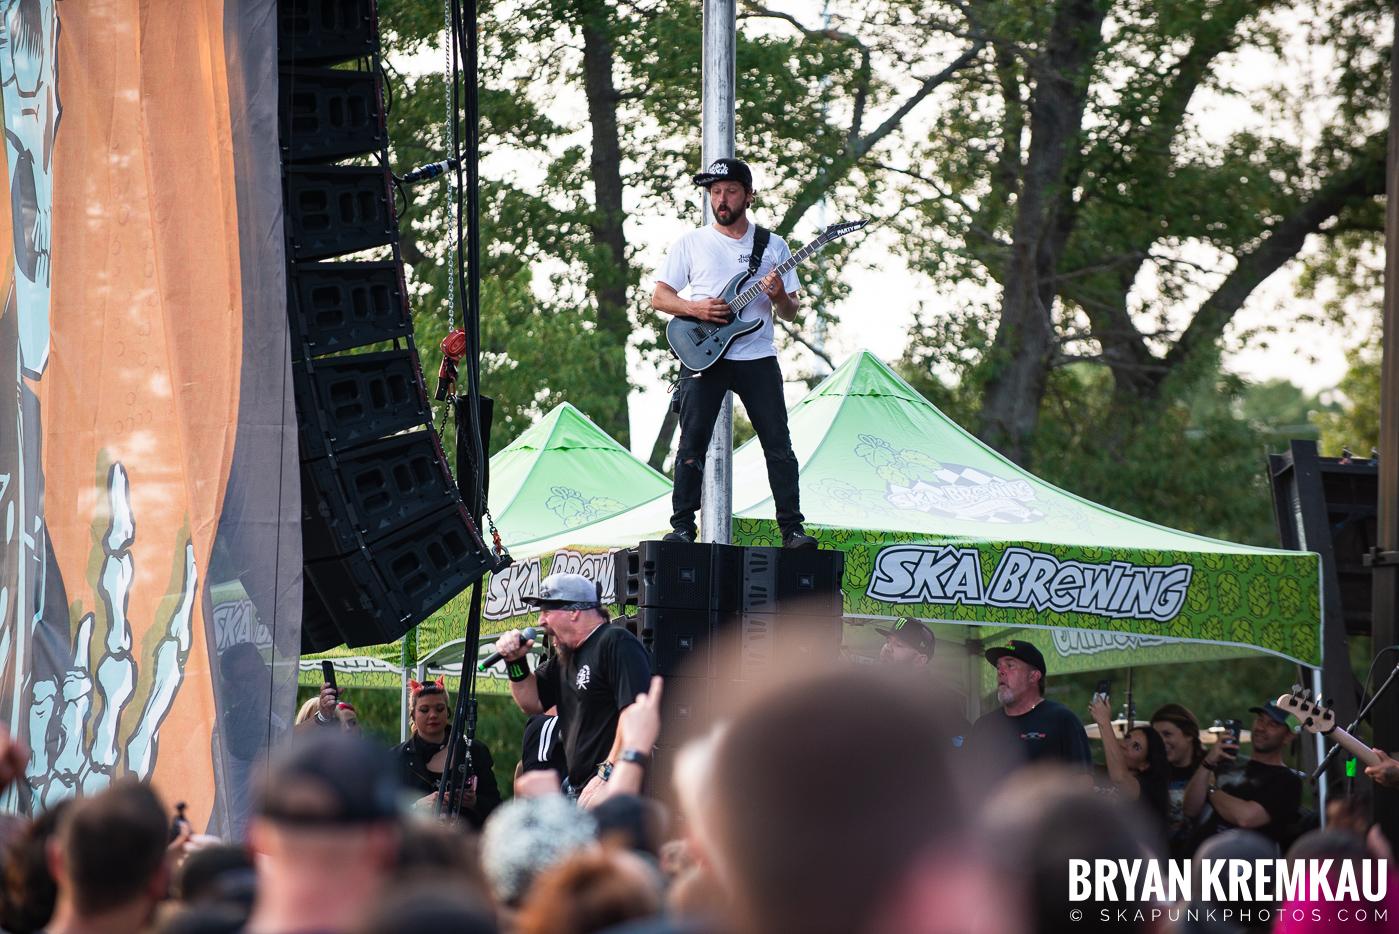 Suicidal Tendencies @ The Bash Music & Craft Beer Festival, Old Bridge Township Raceway Park, Englishtown, NJ - 6.2.19 (1)